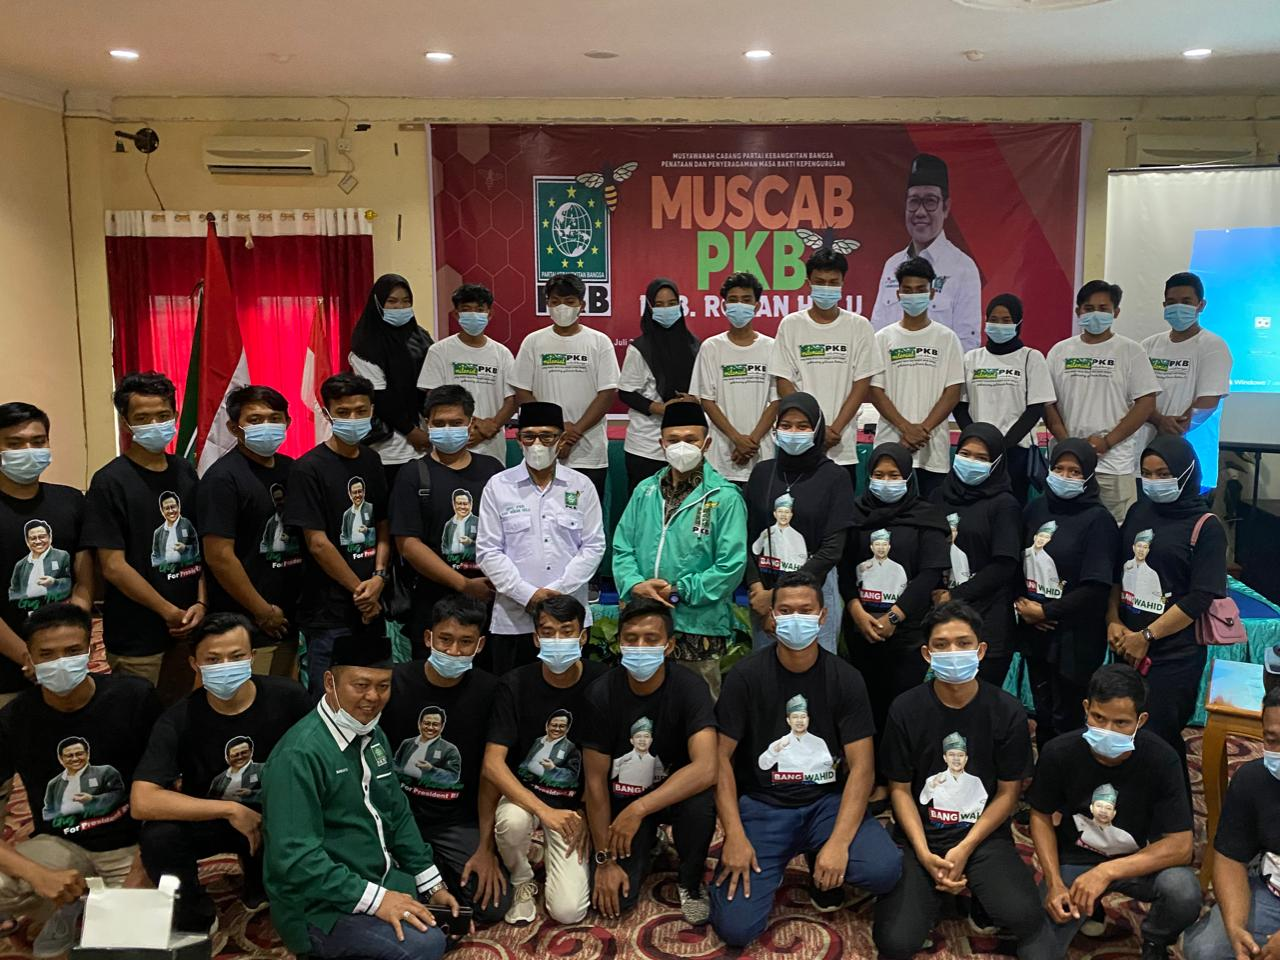 Buka Muscab PKB Rokan Hulu, Abdul Wahid dikejutkan dengan Penampilan Anak Muda Milenial PKB